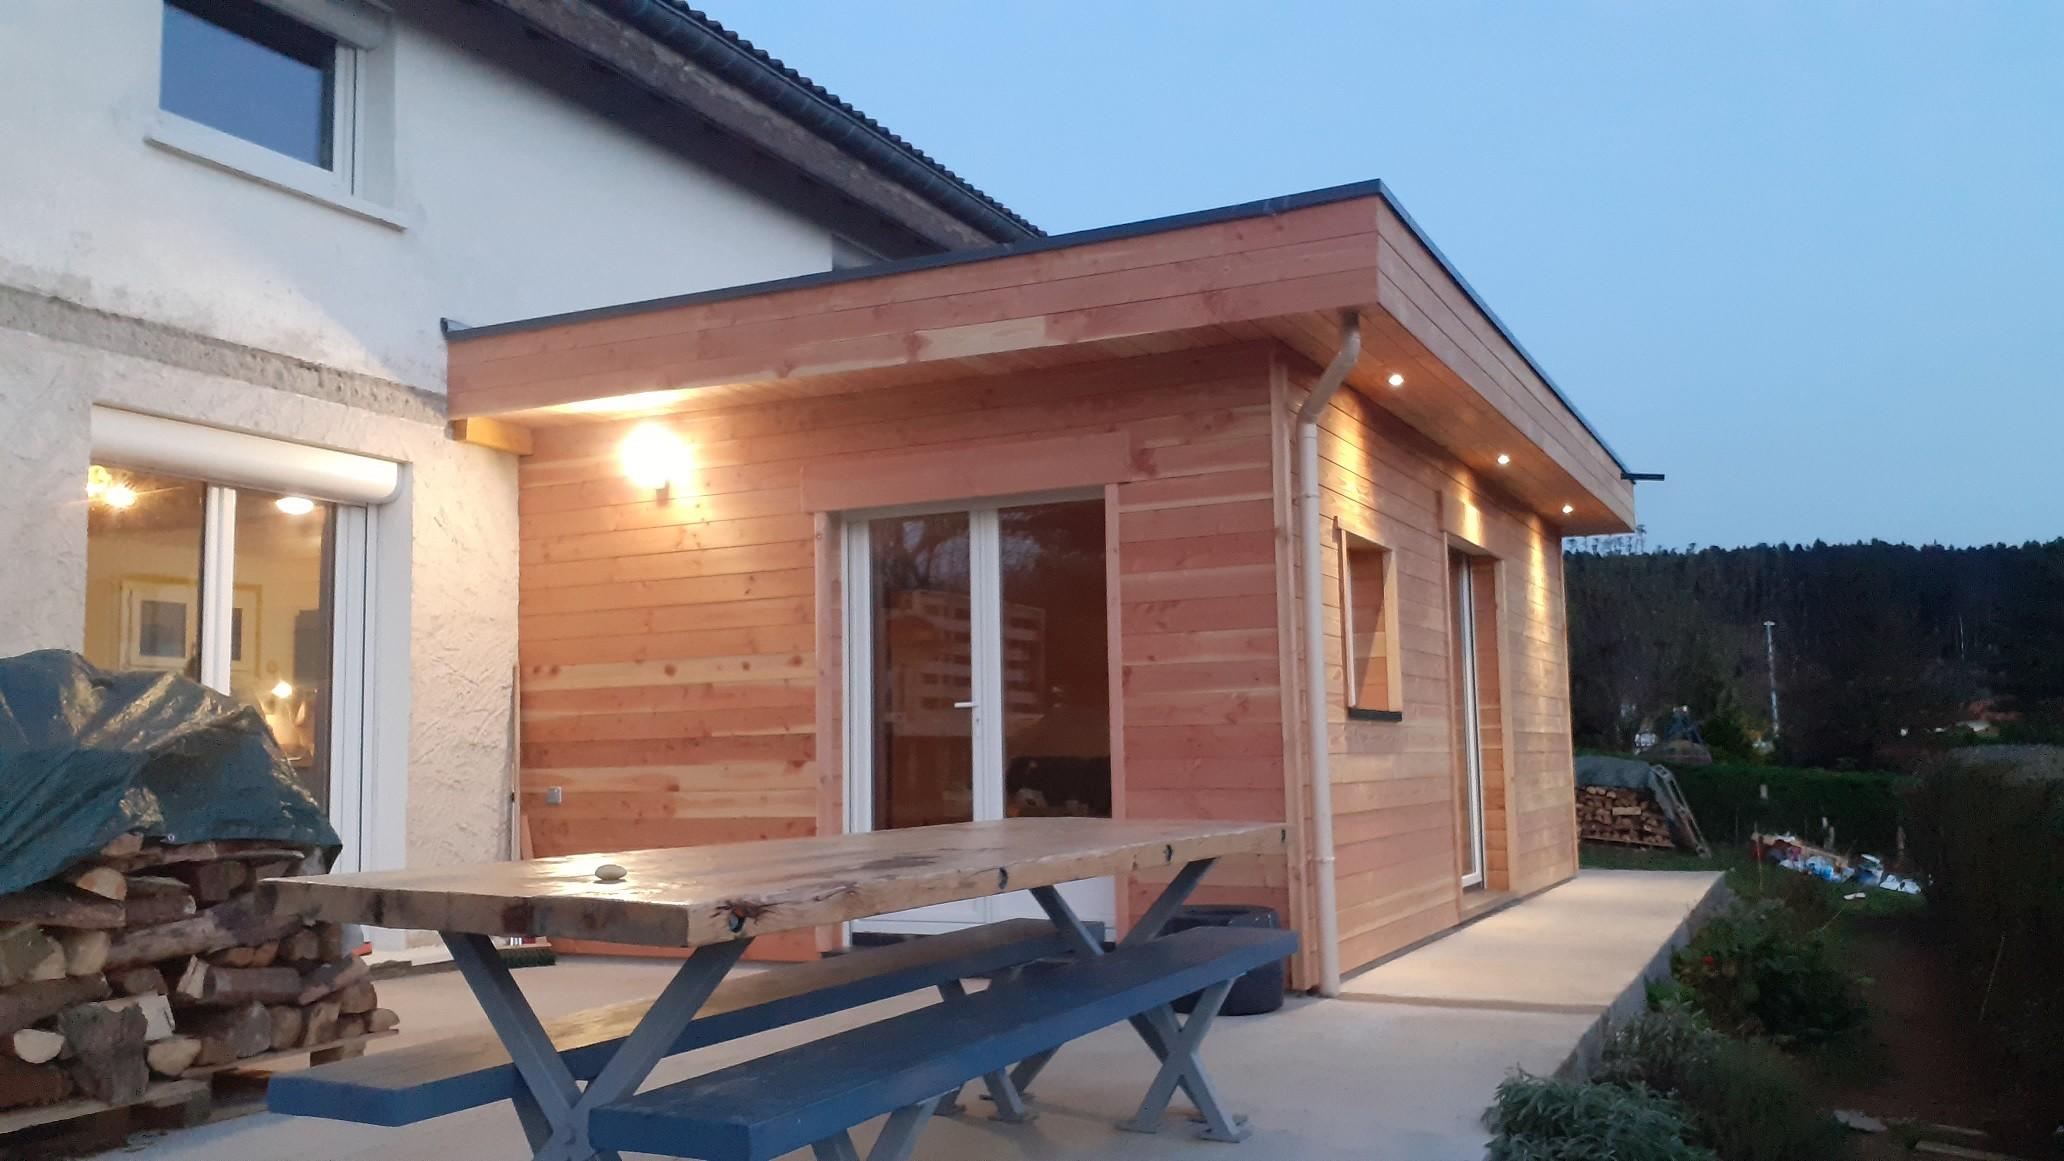 extension toiture-terrasse